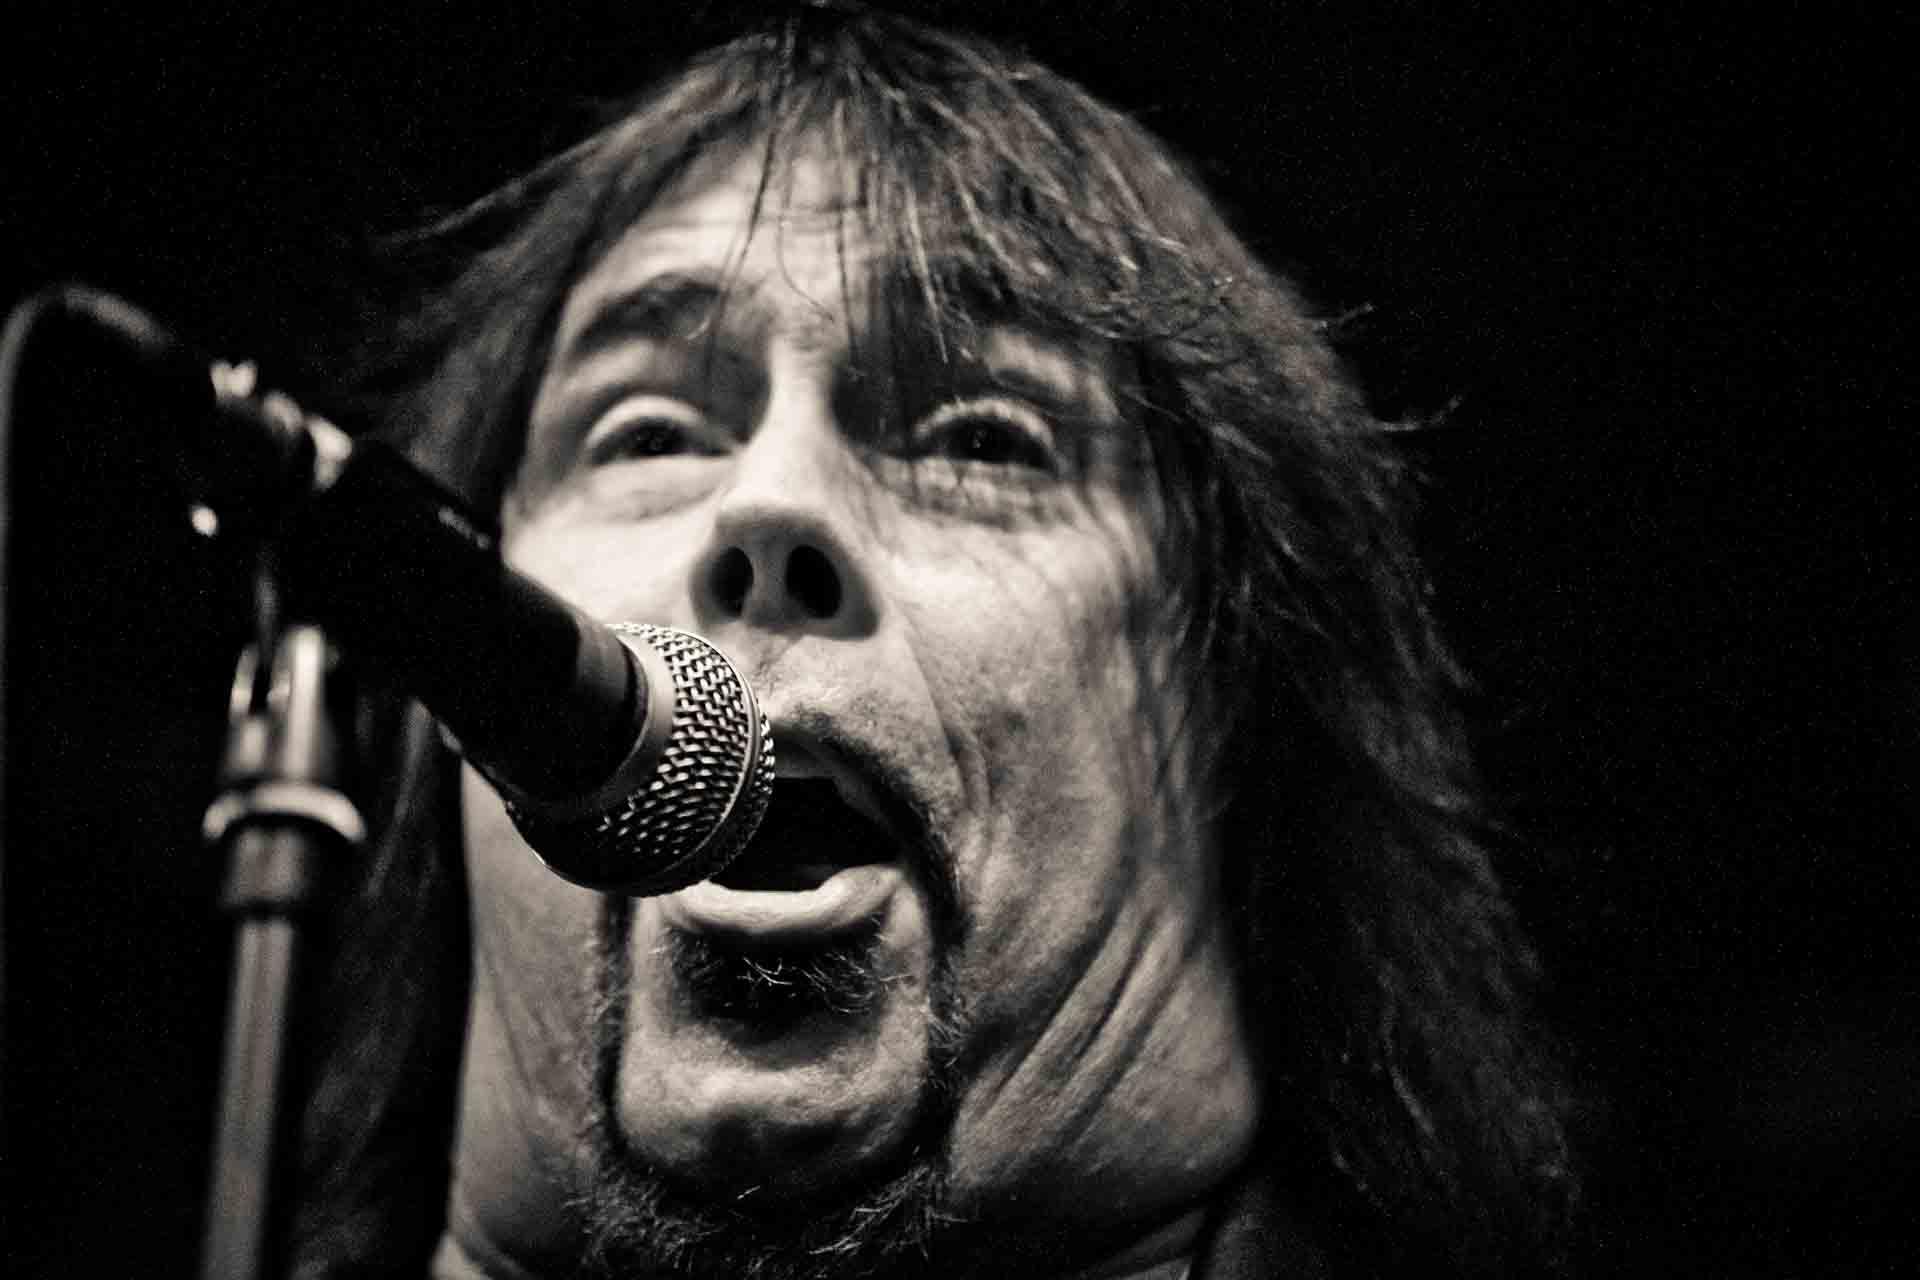 monster_magnet_im_dezember_2011_in_muenchen_im_backstage_1_20111206_1910251034